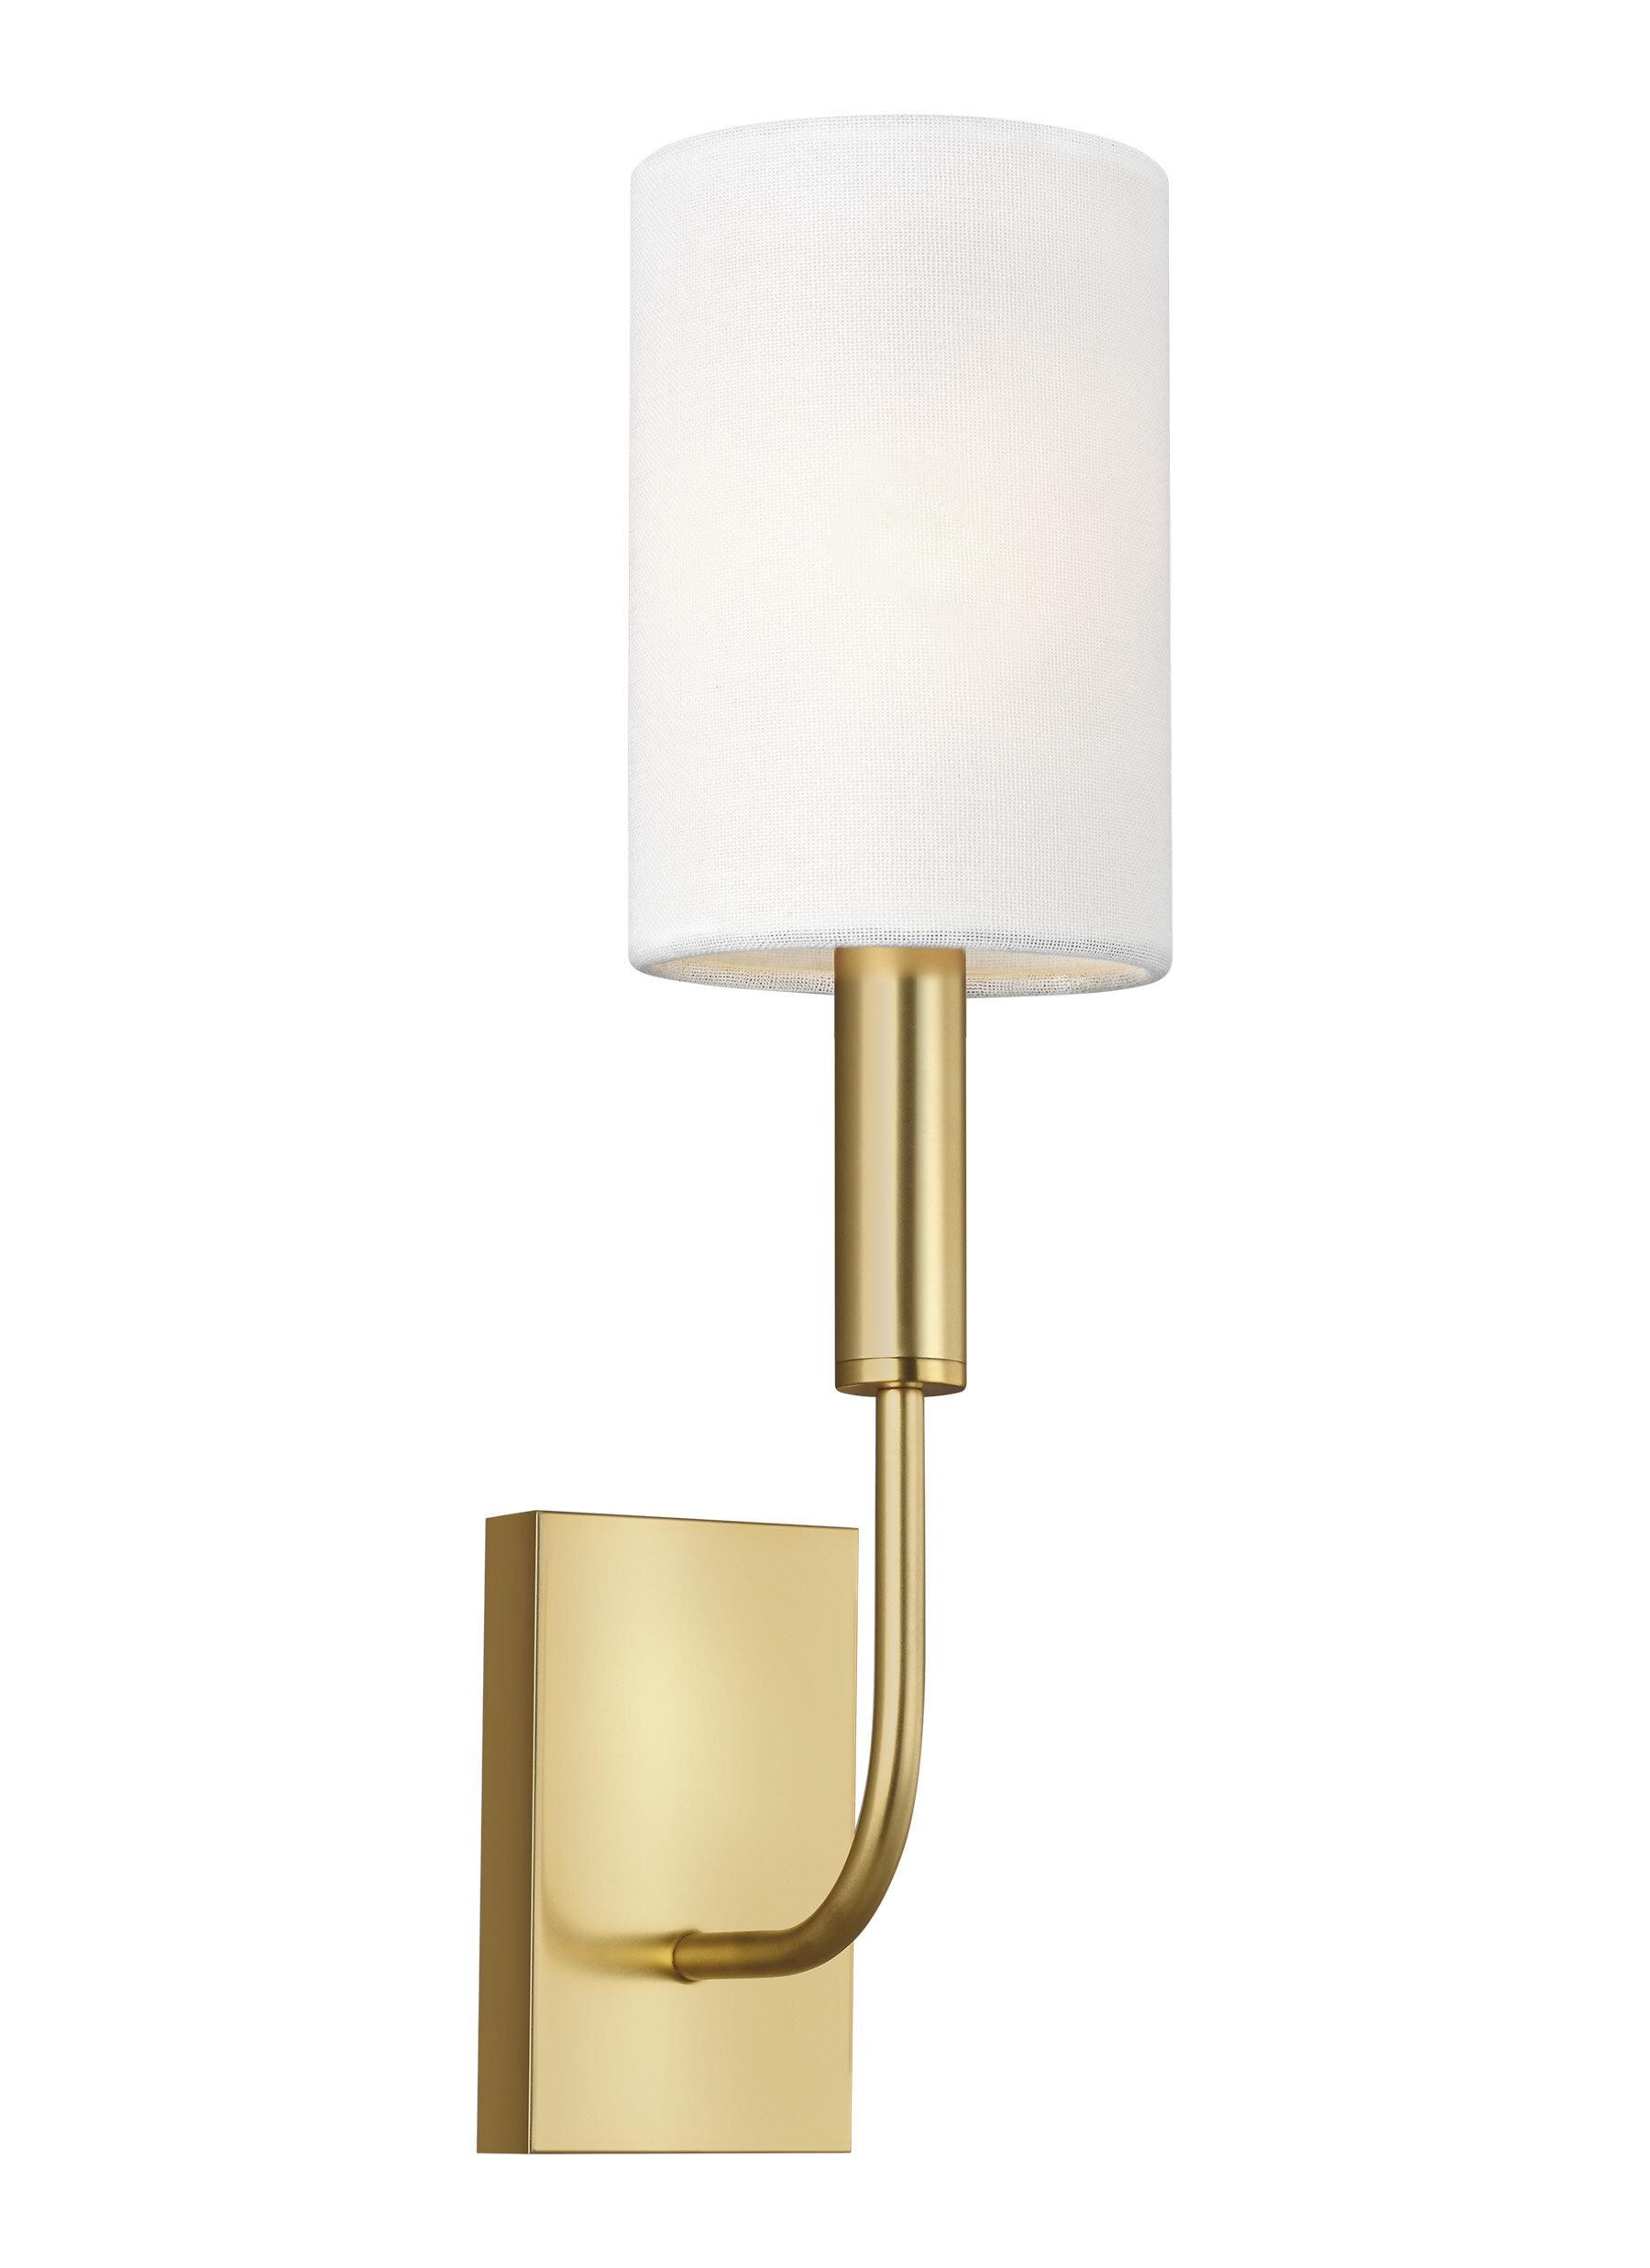 Ed Ellen De Generes Crafted Bygenerationlighting Brianna 1 Light Dimmable Candle Wall Light Reviews Wayfair